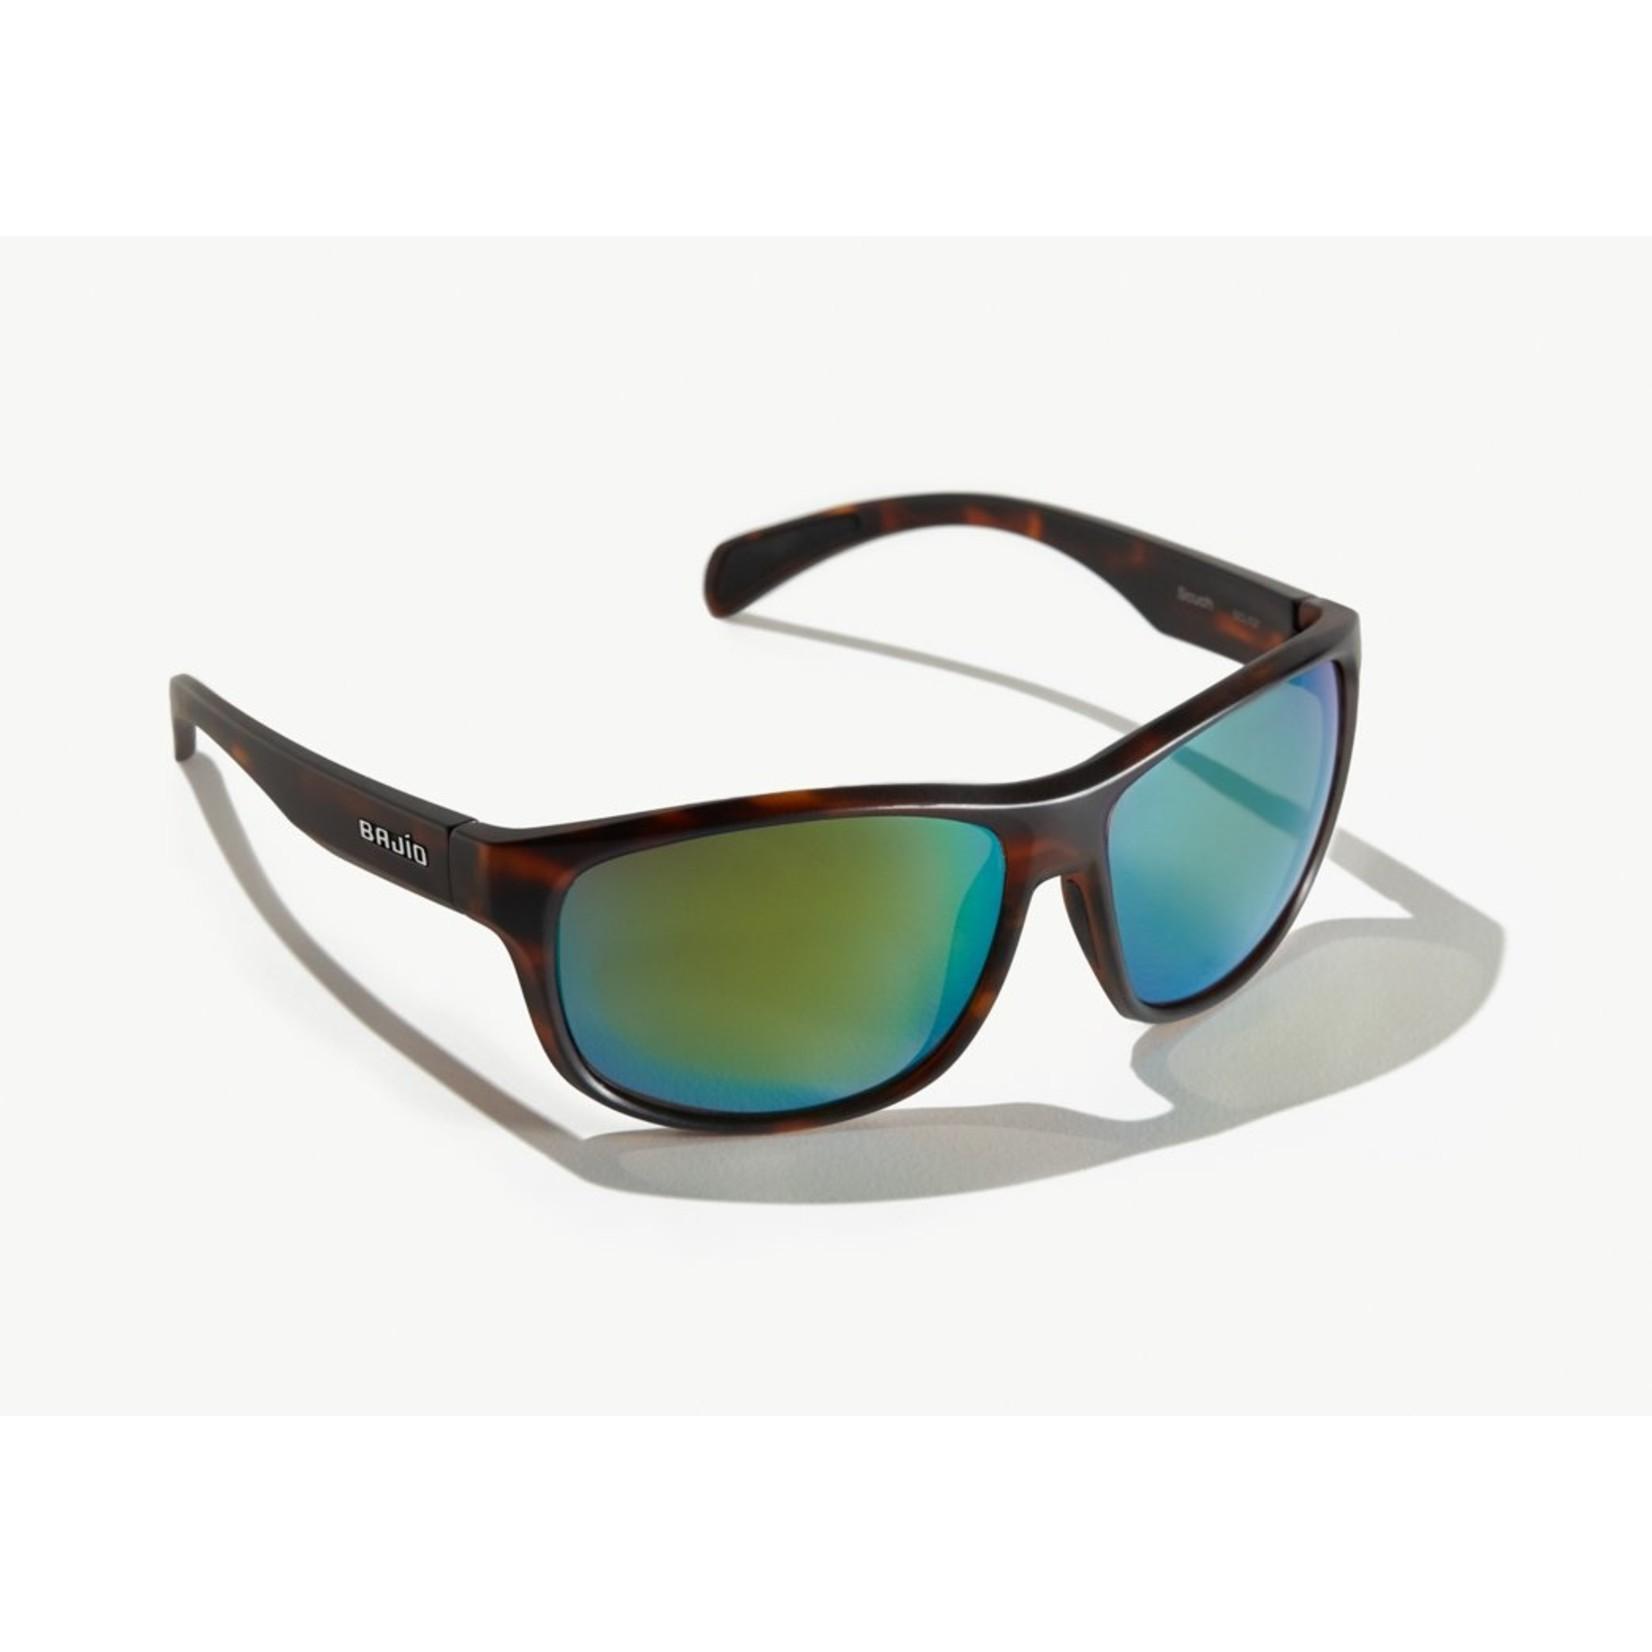 Bajio Bajio Scuch Polarized Sunglasses